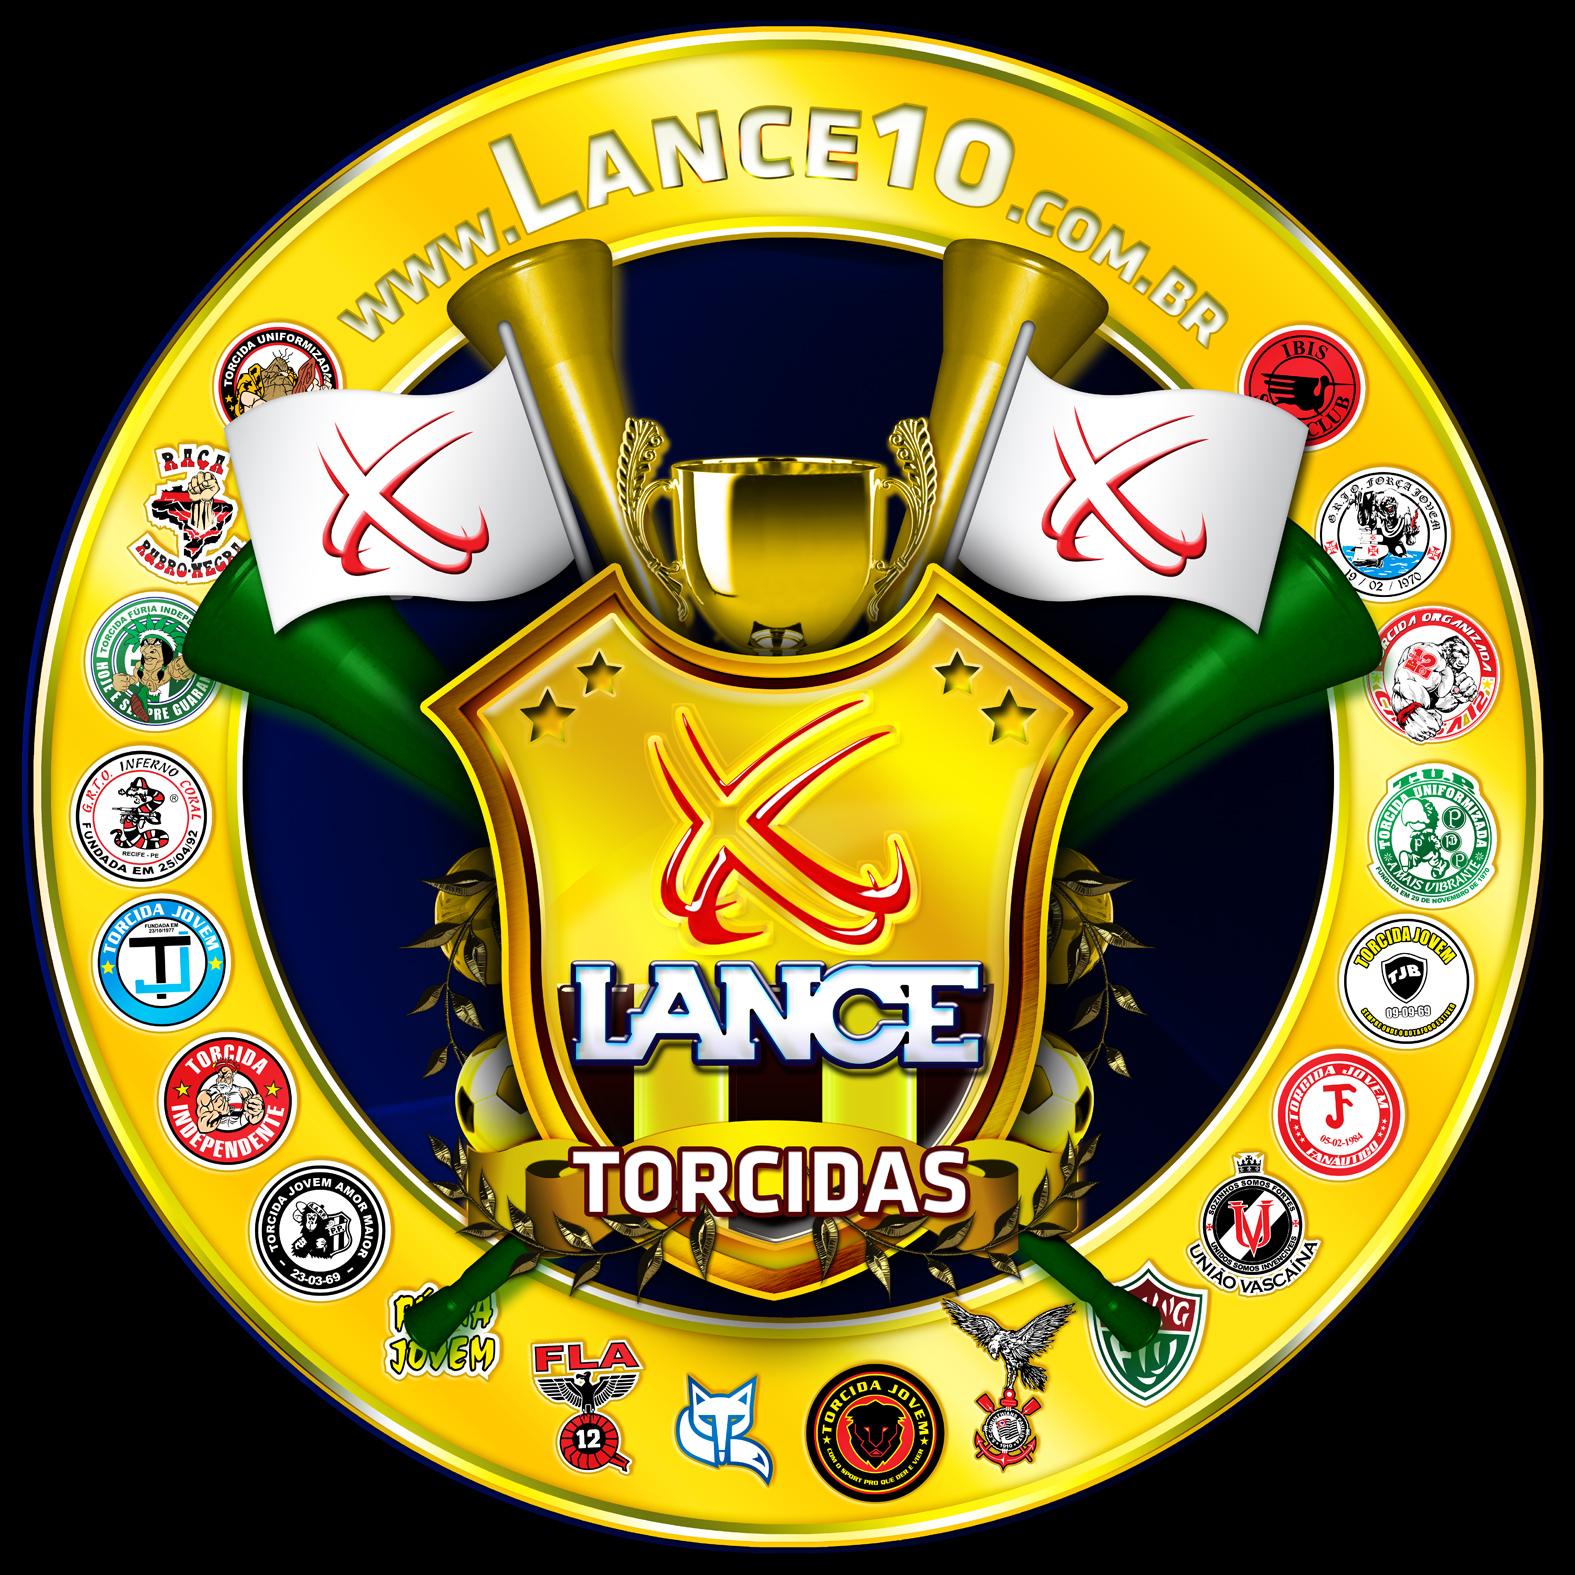 Lance_T_1